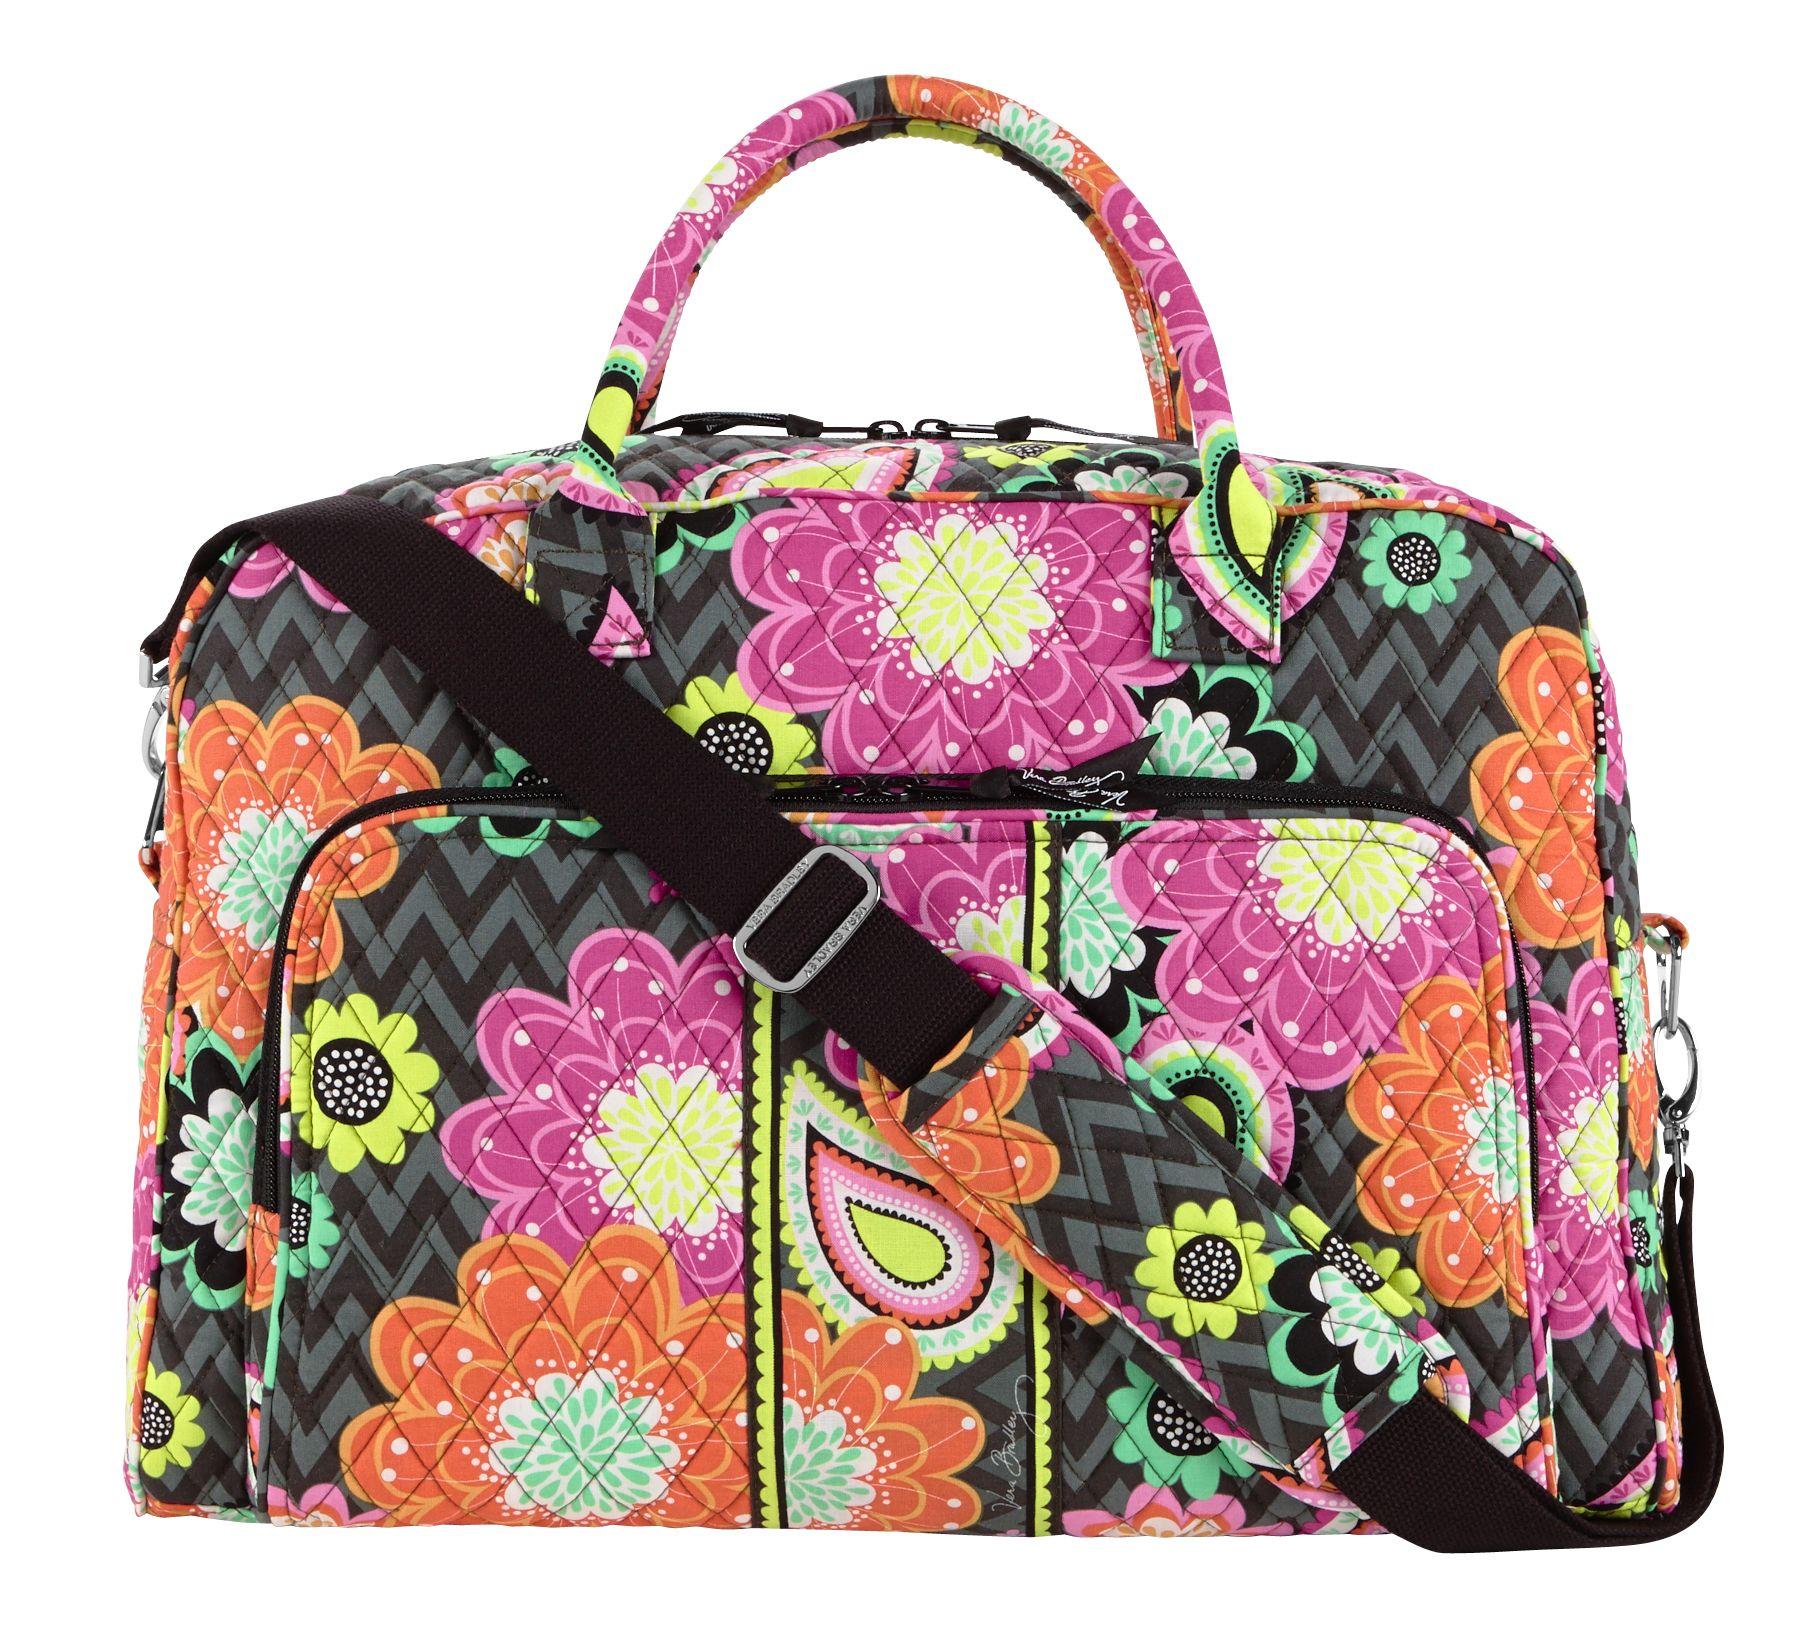 29ec70657a4c Vera Bradley Overnight Bag Dimensions